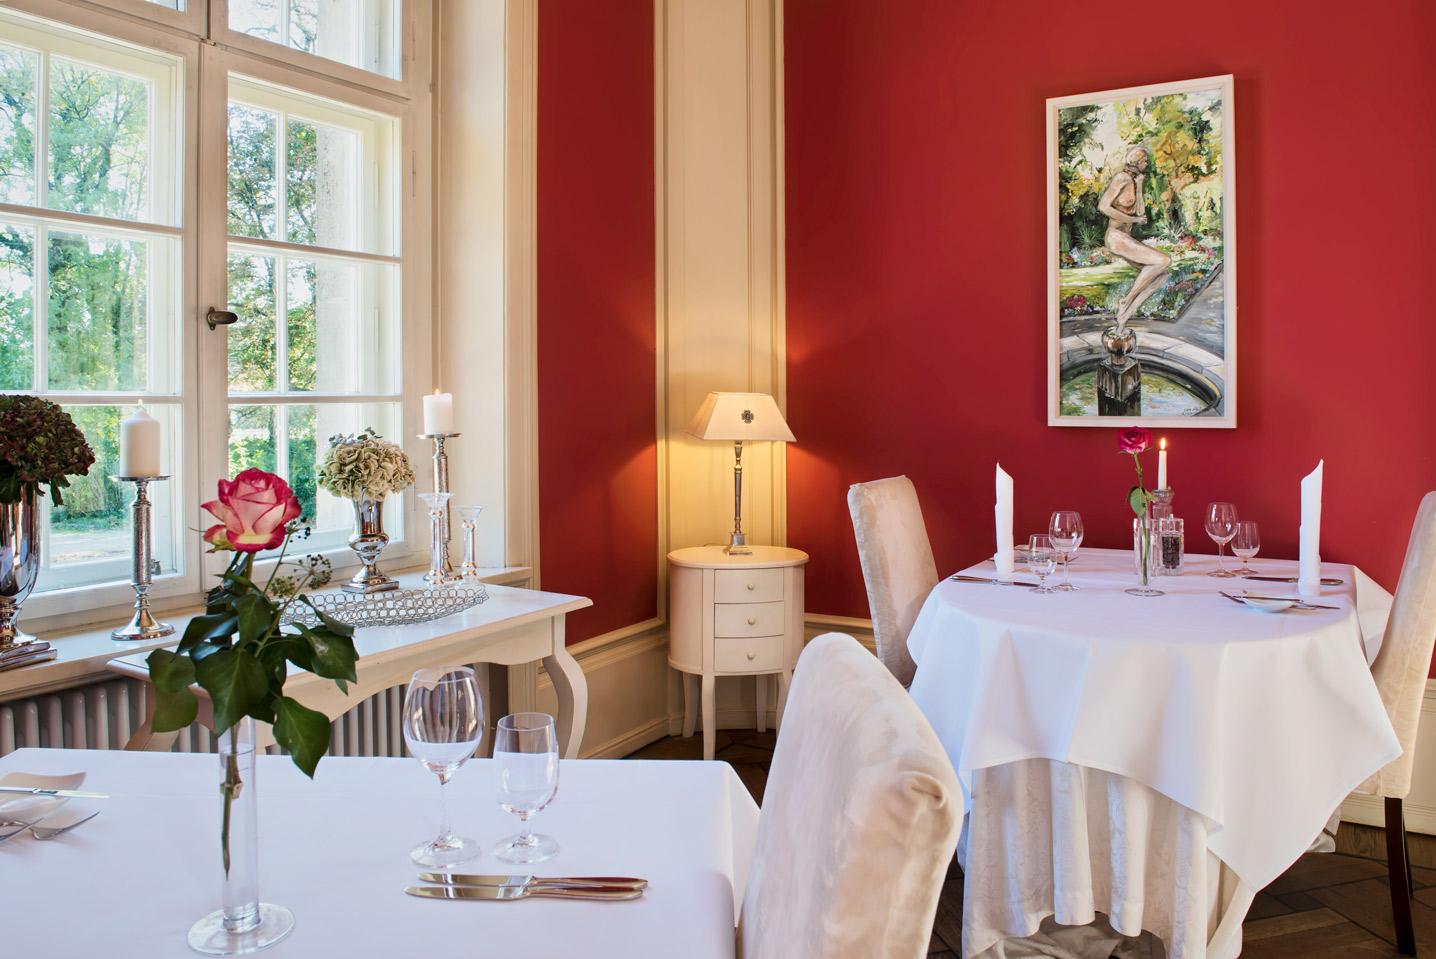 Hotel Schloss Kartzow Potsdam_Anna Nesterenko